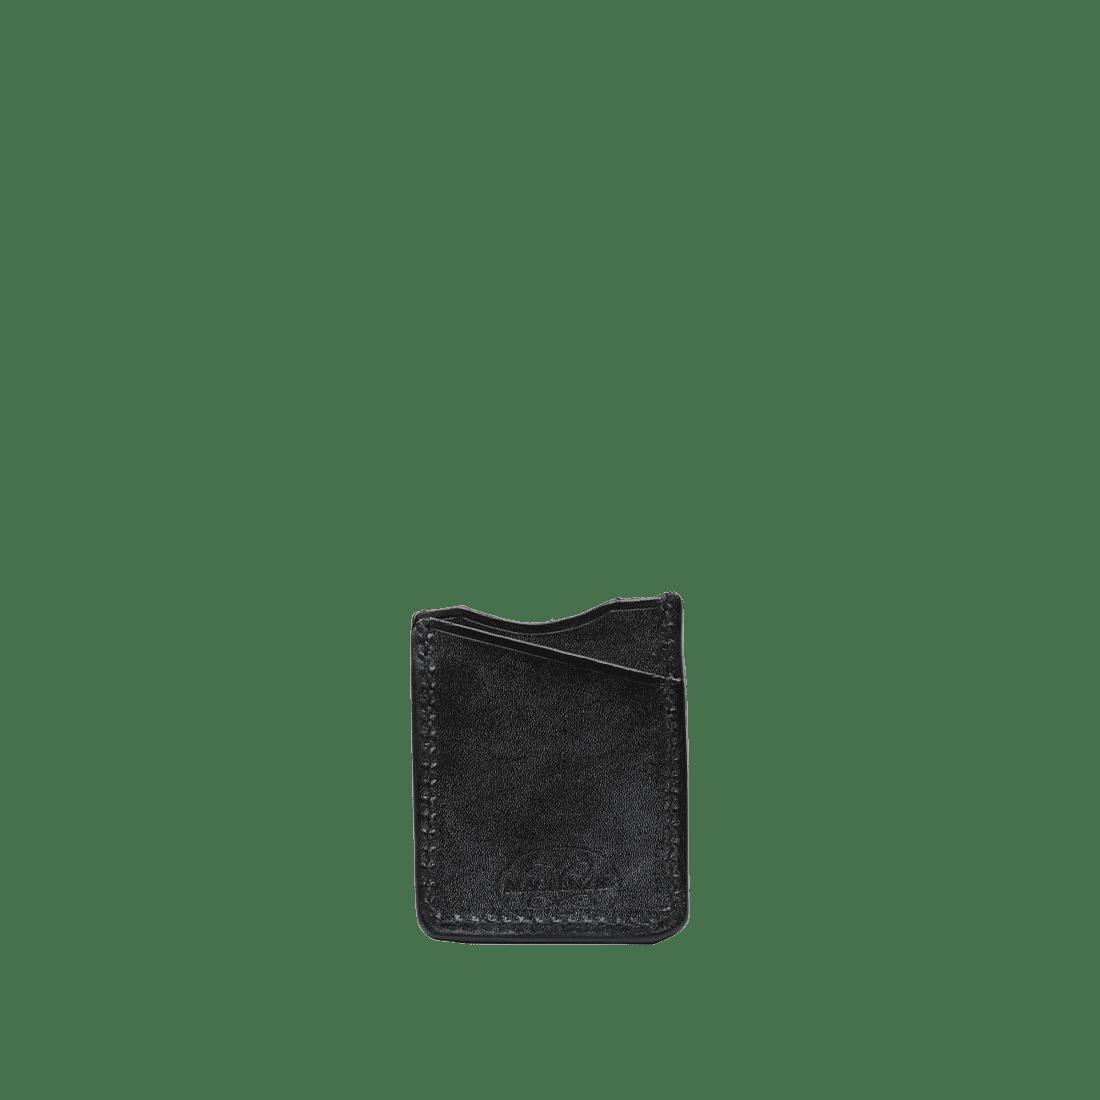 The Oak Card Holder Black